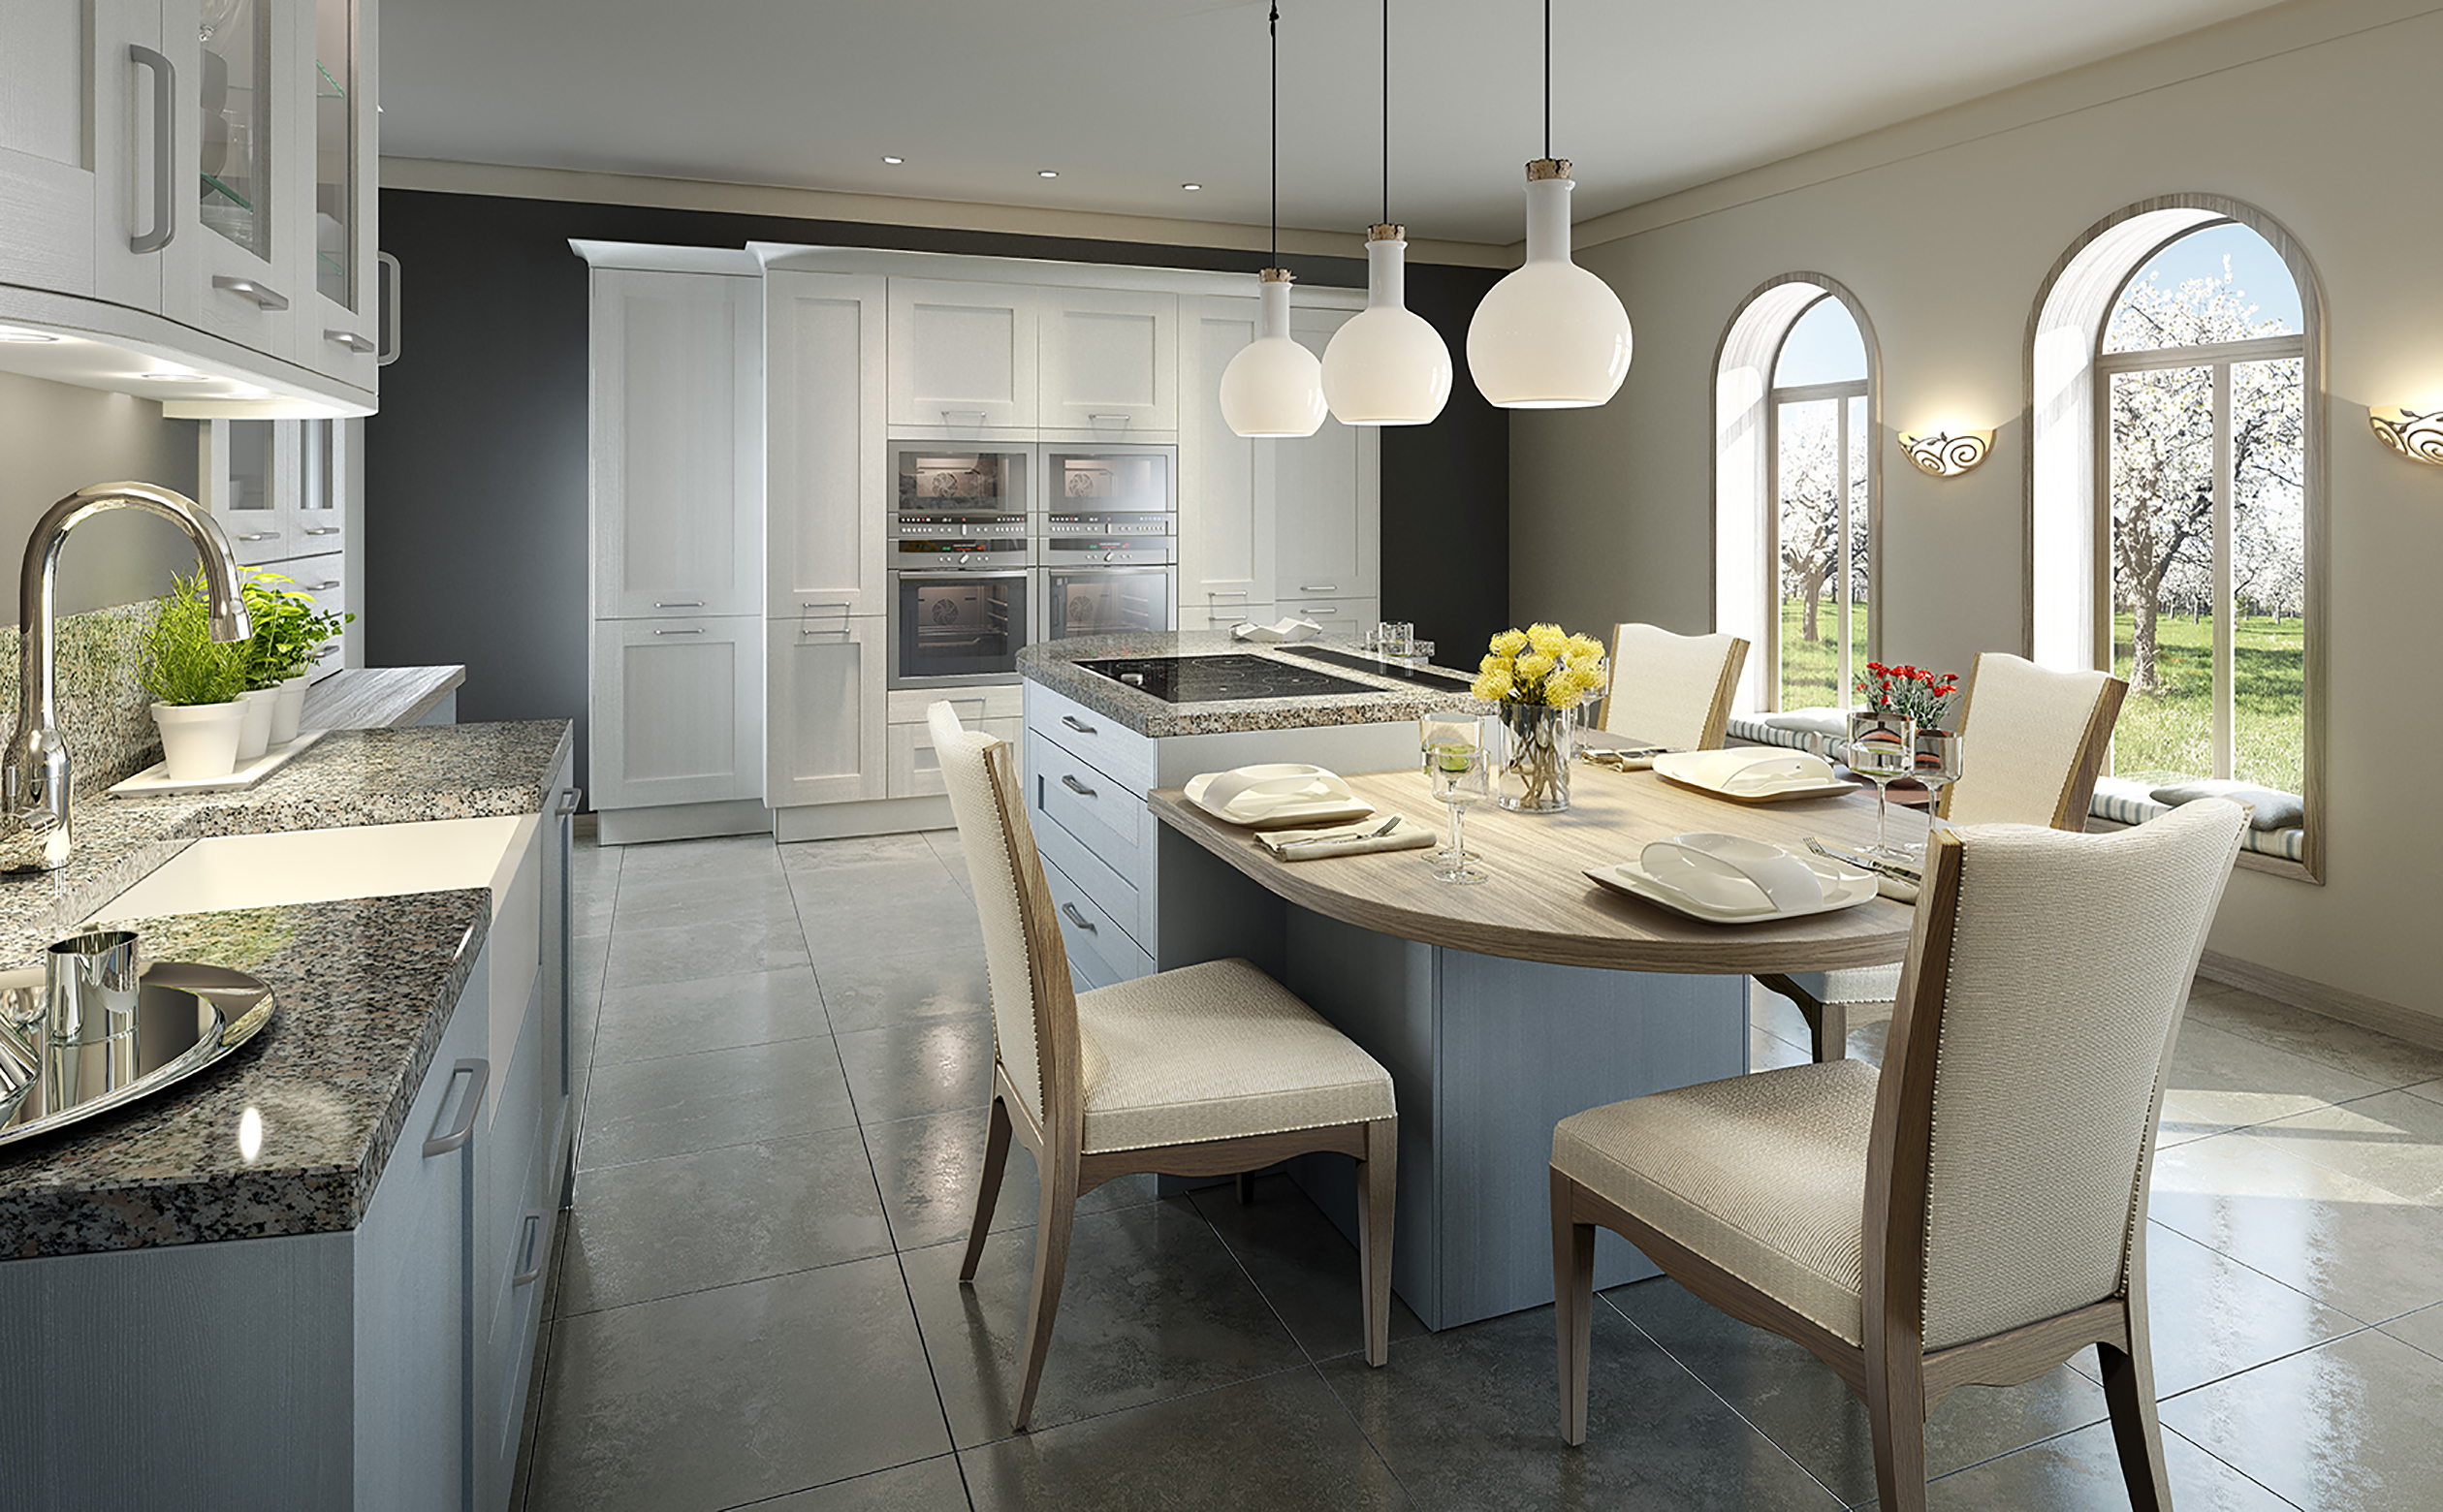 k che blau kueche blau p2 ptc kitchens kueche blau p4 ptc kitchens retro k che blau leuchter. Black Bedroom Furniture Sets. Home Design Ideas